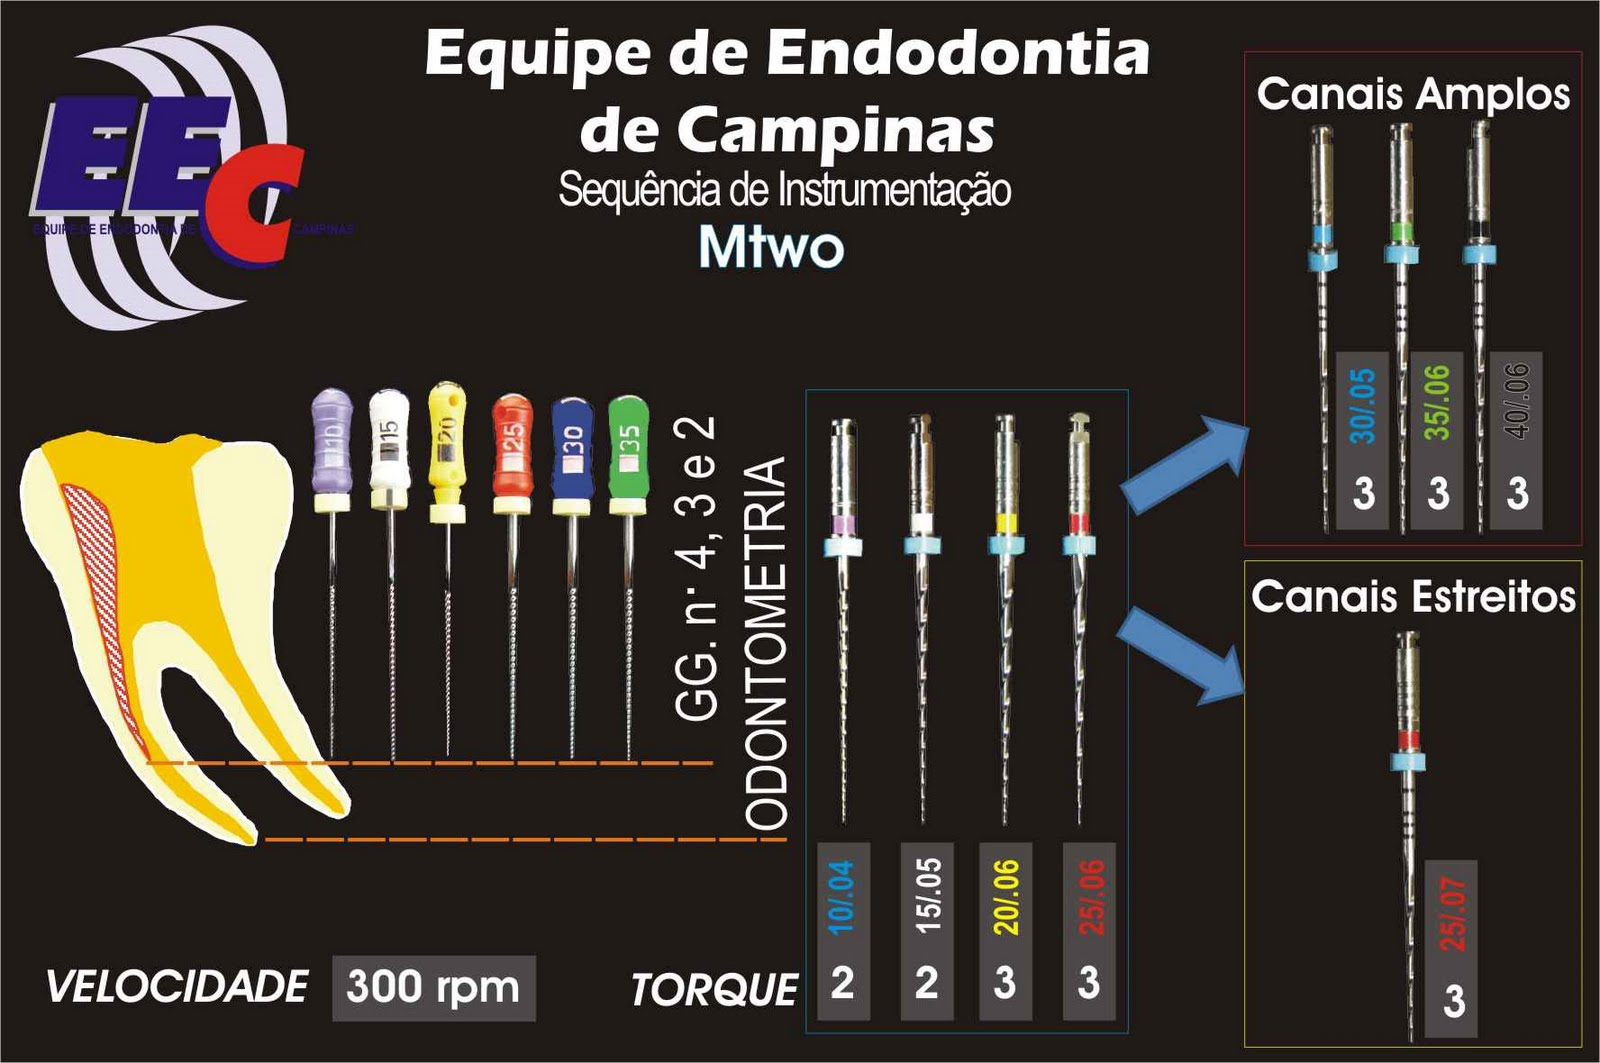 EQUIPE DE ENDODONTIA DE CAMPINAS: Protocolo de Limas ...